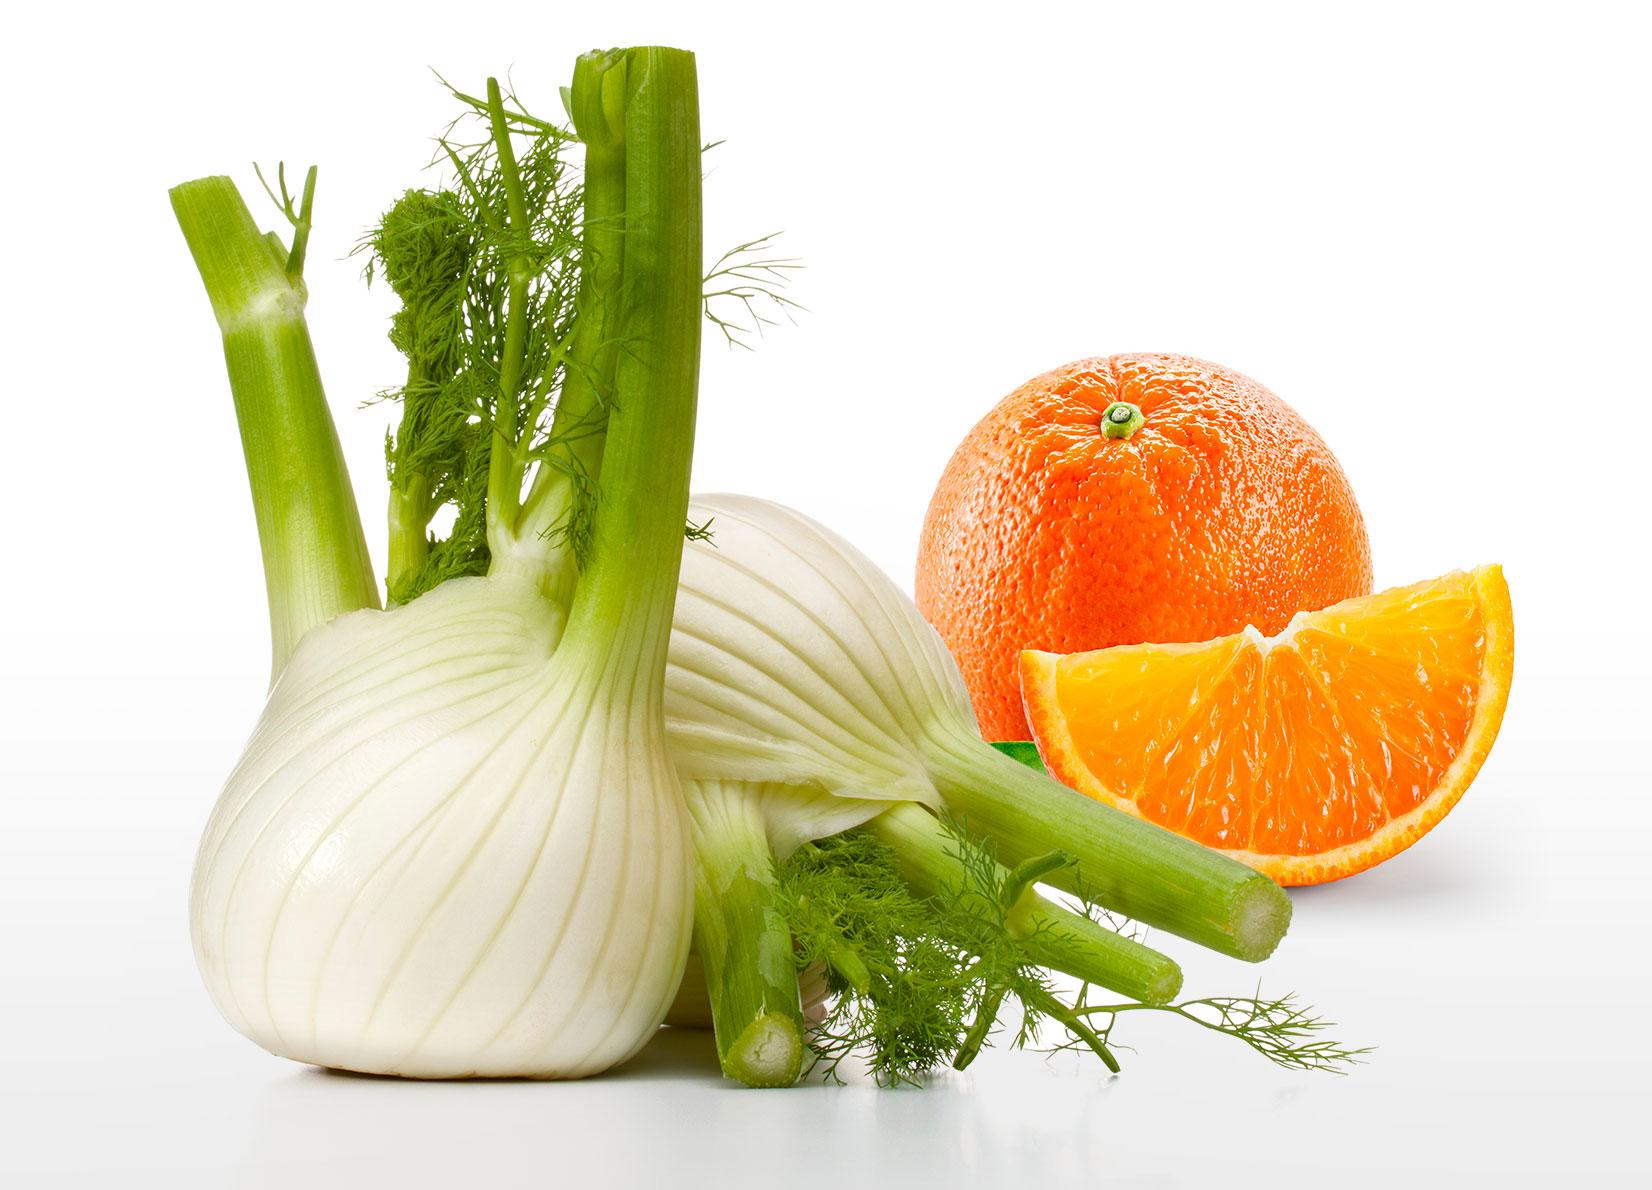 insalata food ananas agrumi consigli estate